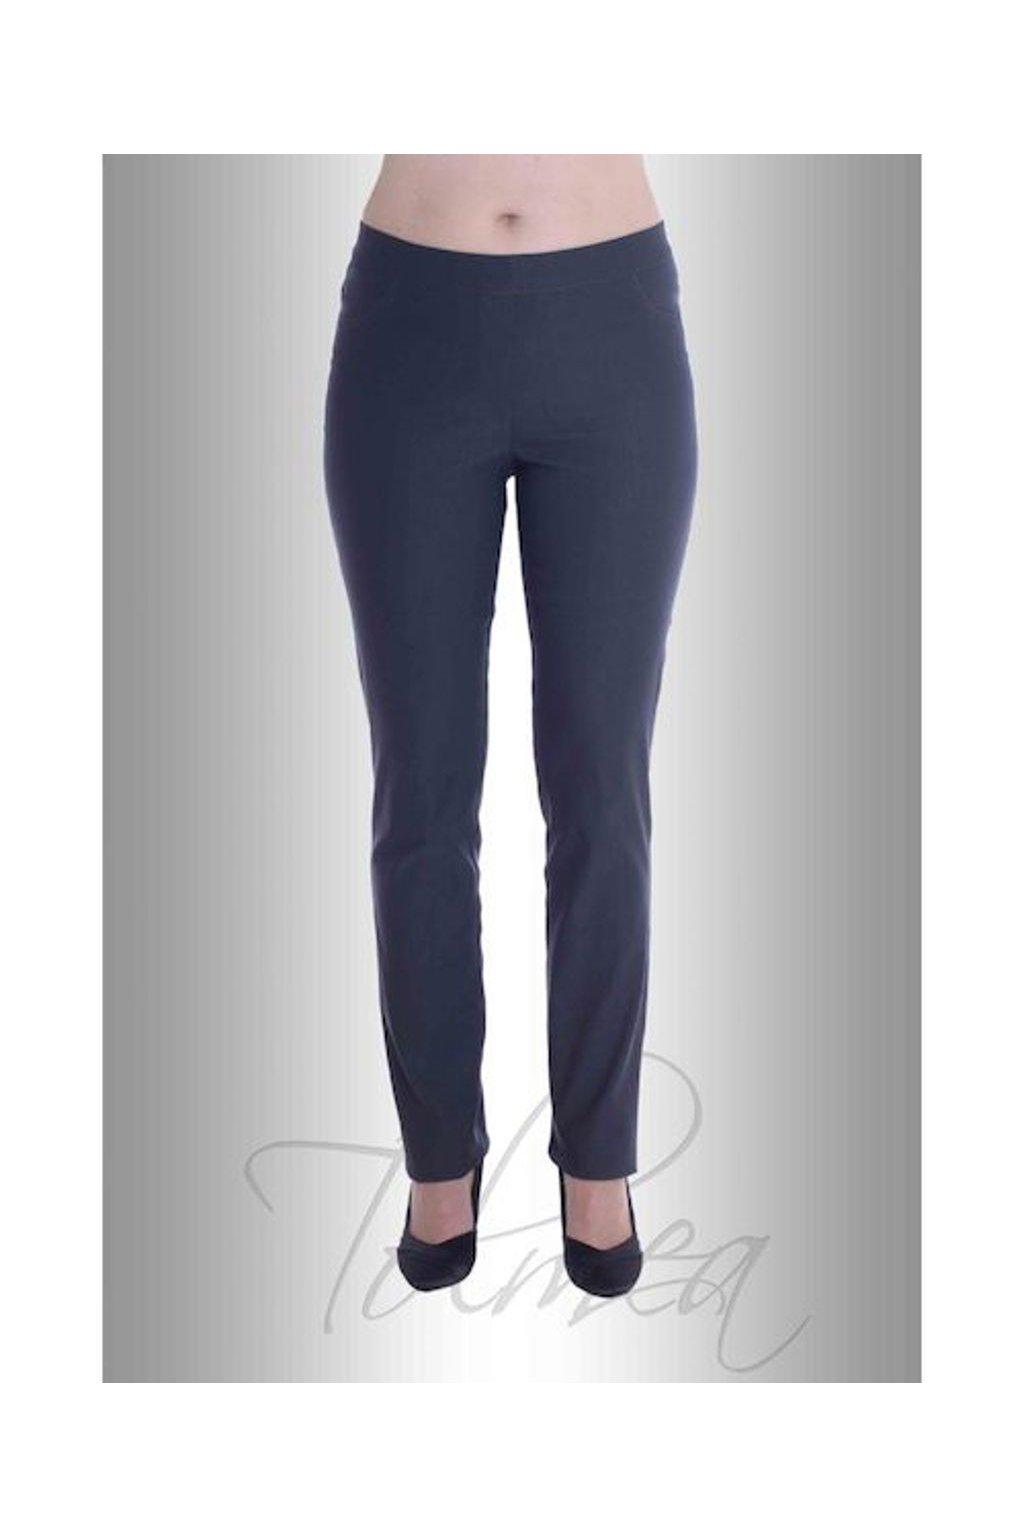 Kalhoty elastické džegíny 51T (Velikost 36, Barva Modrá)